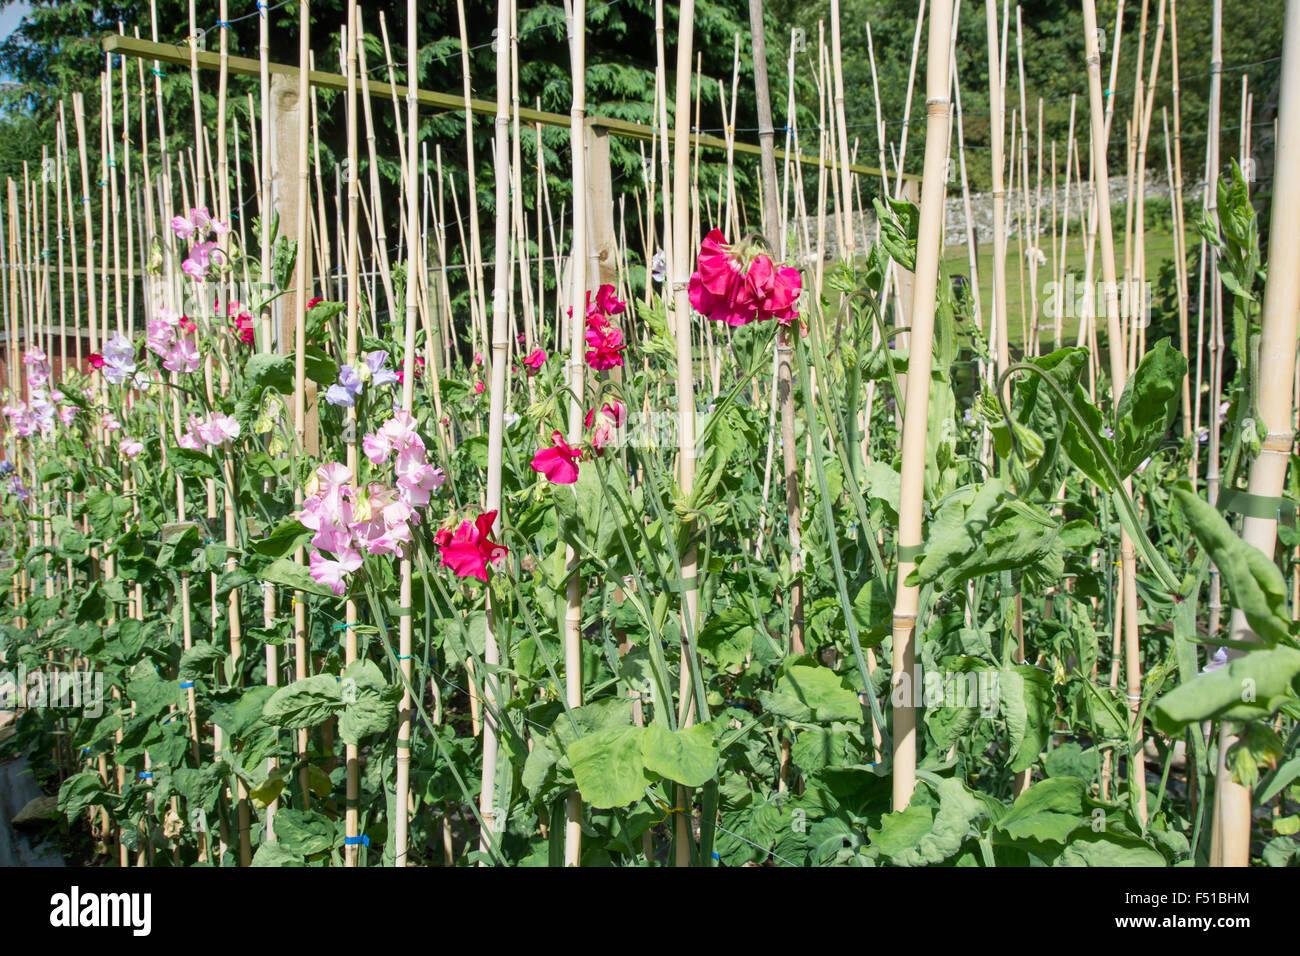 Cordon Sweet Peas Growing Up Canes Stock Photo 89156192 Alamy